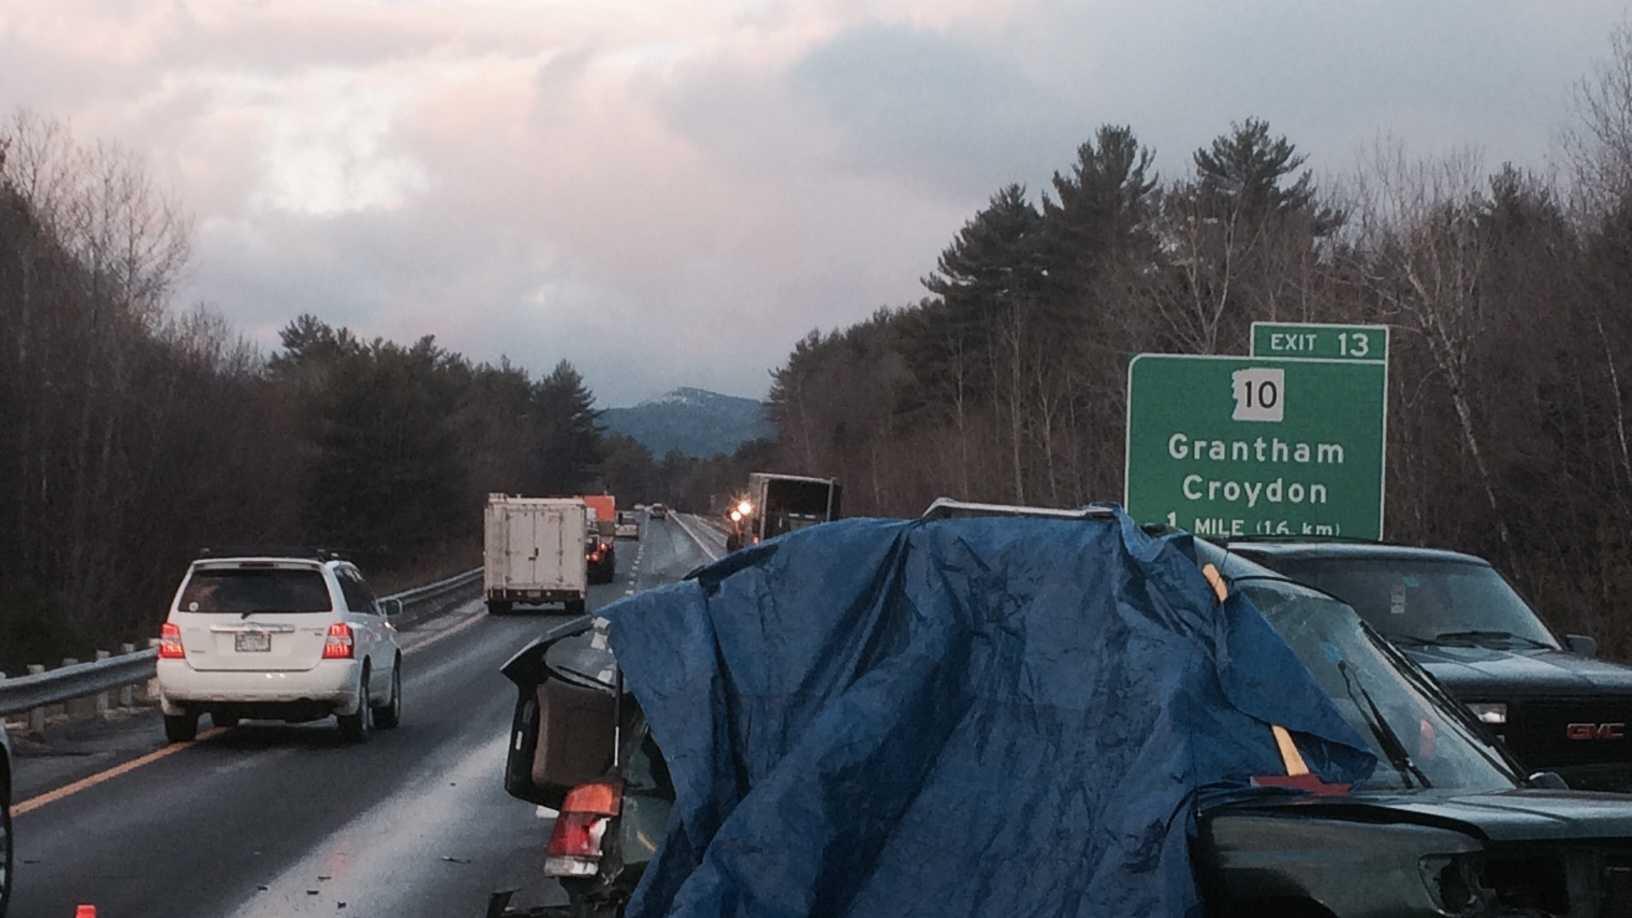 Interstate 89 in Grantham